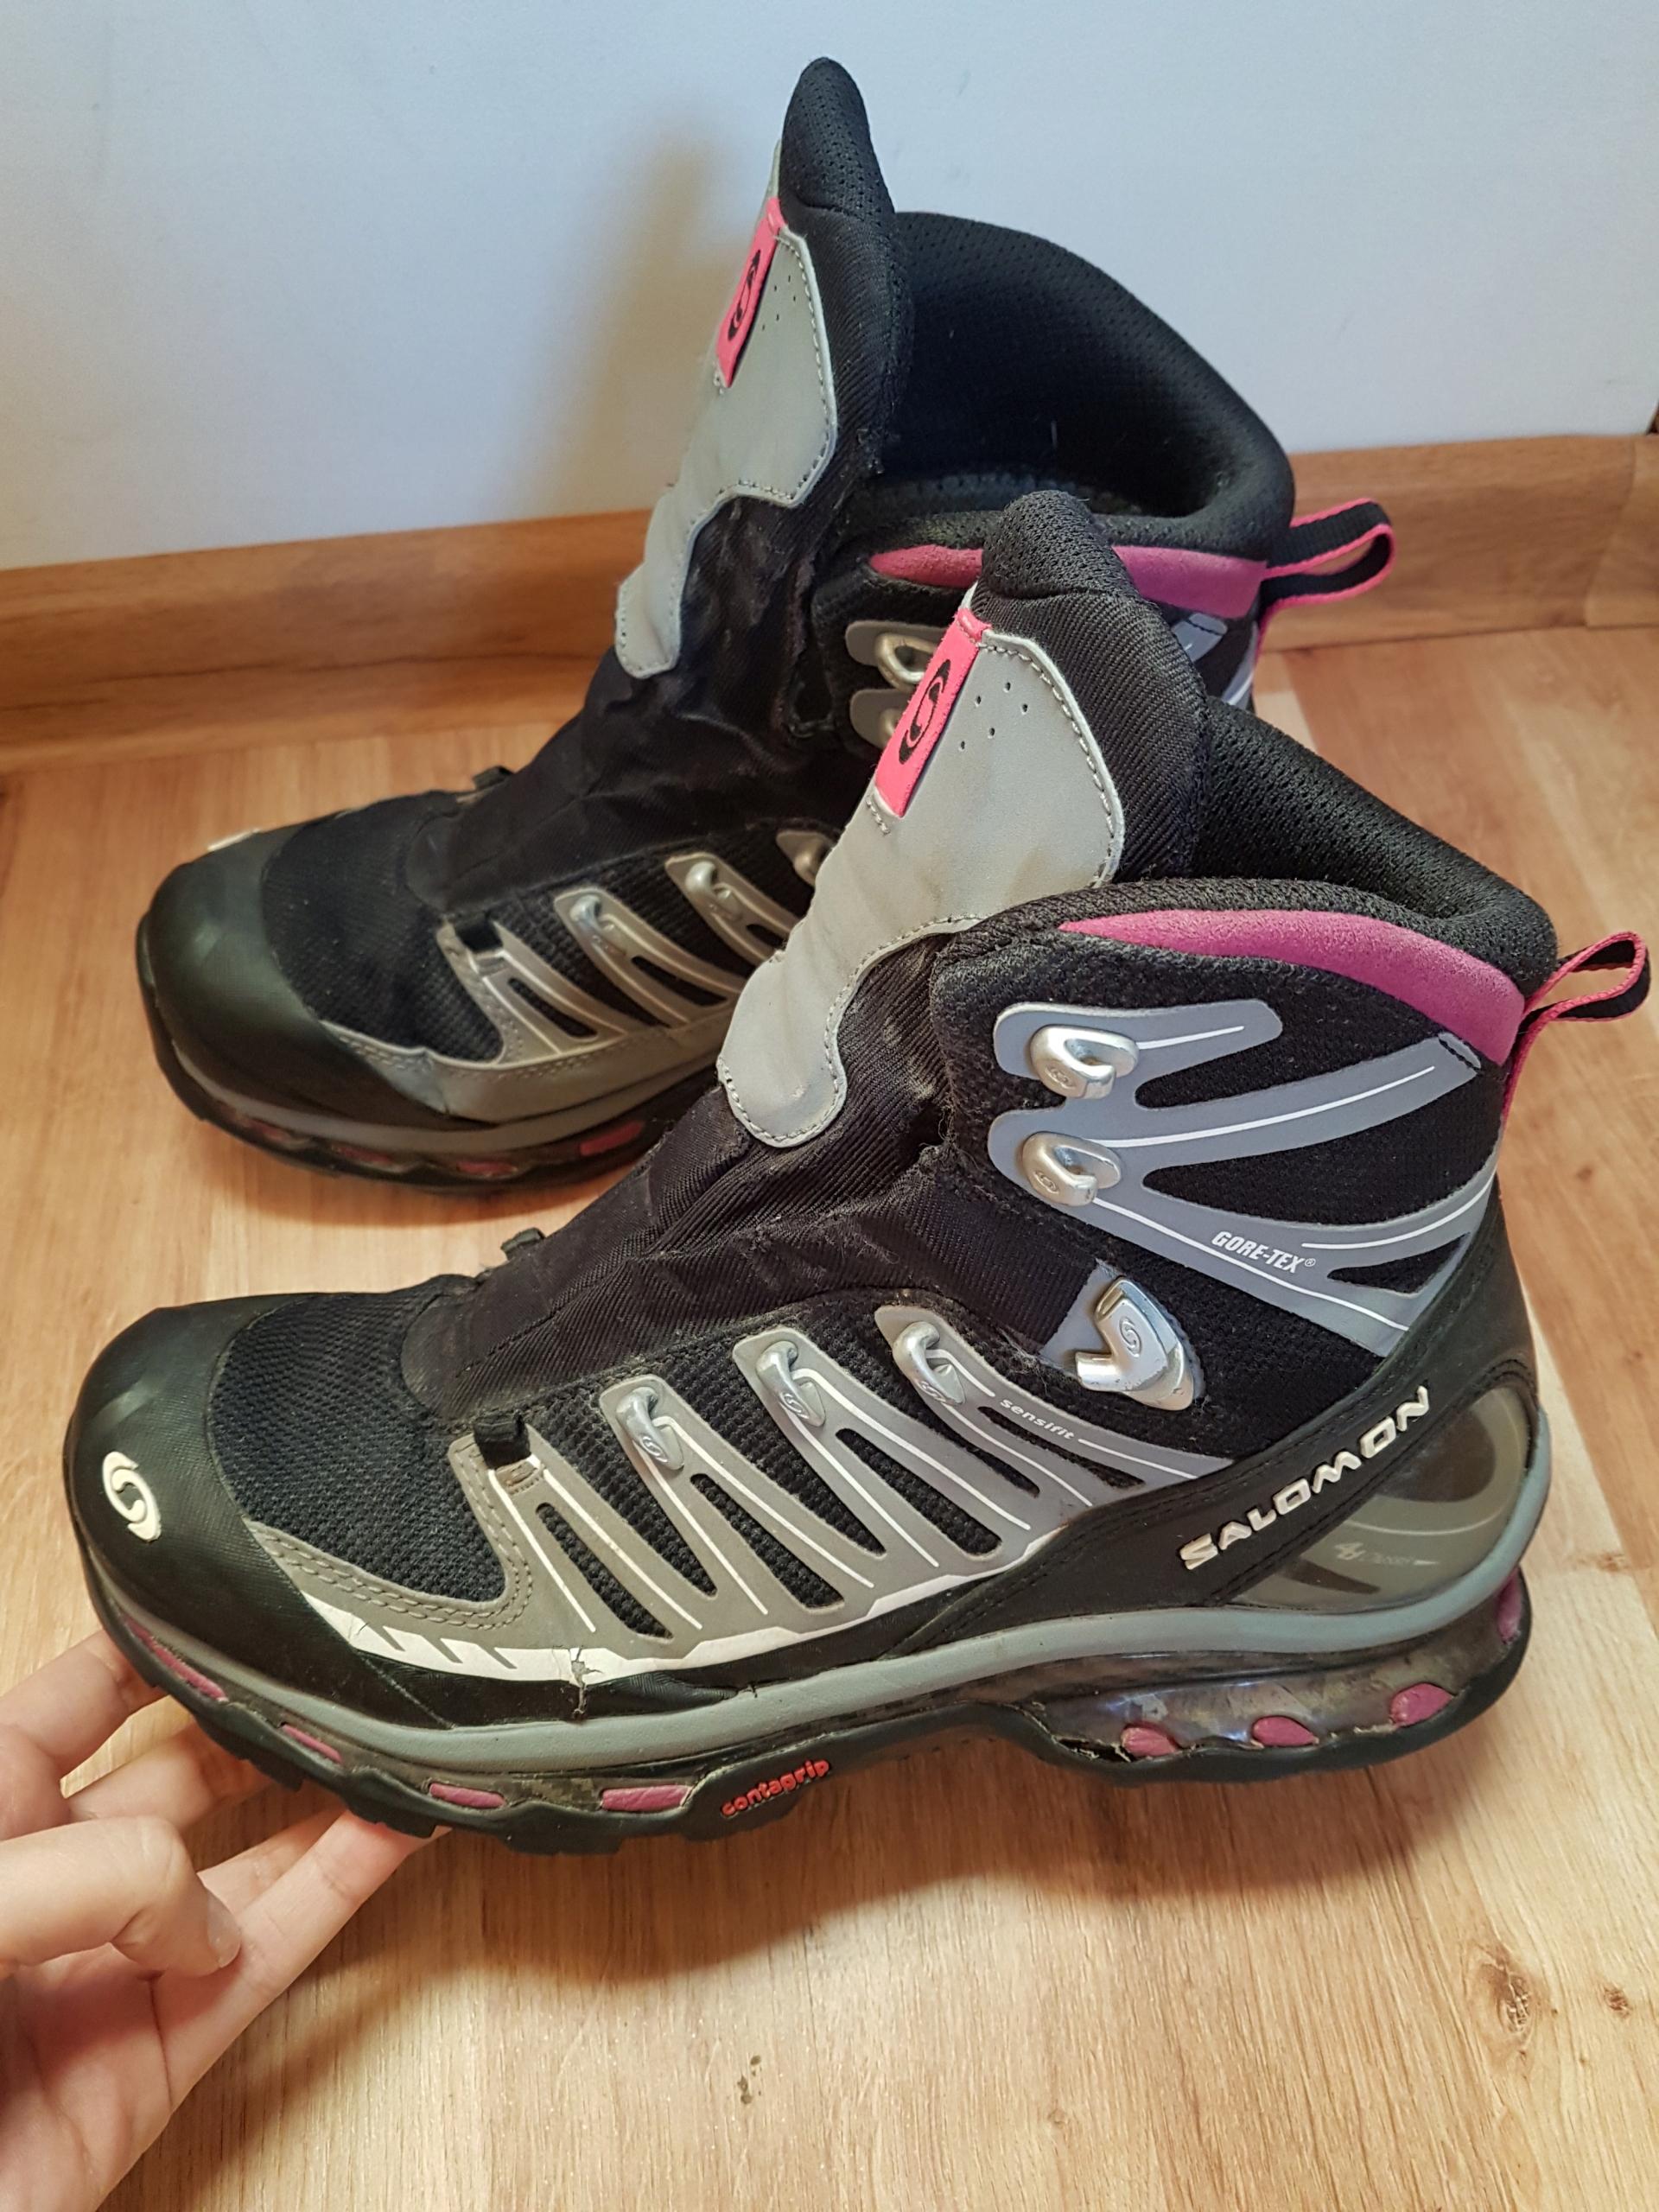 SALOMON COSMIC 4D GTX buty trekkingowe podejściowe